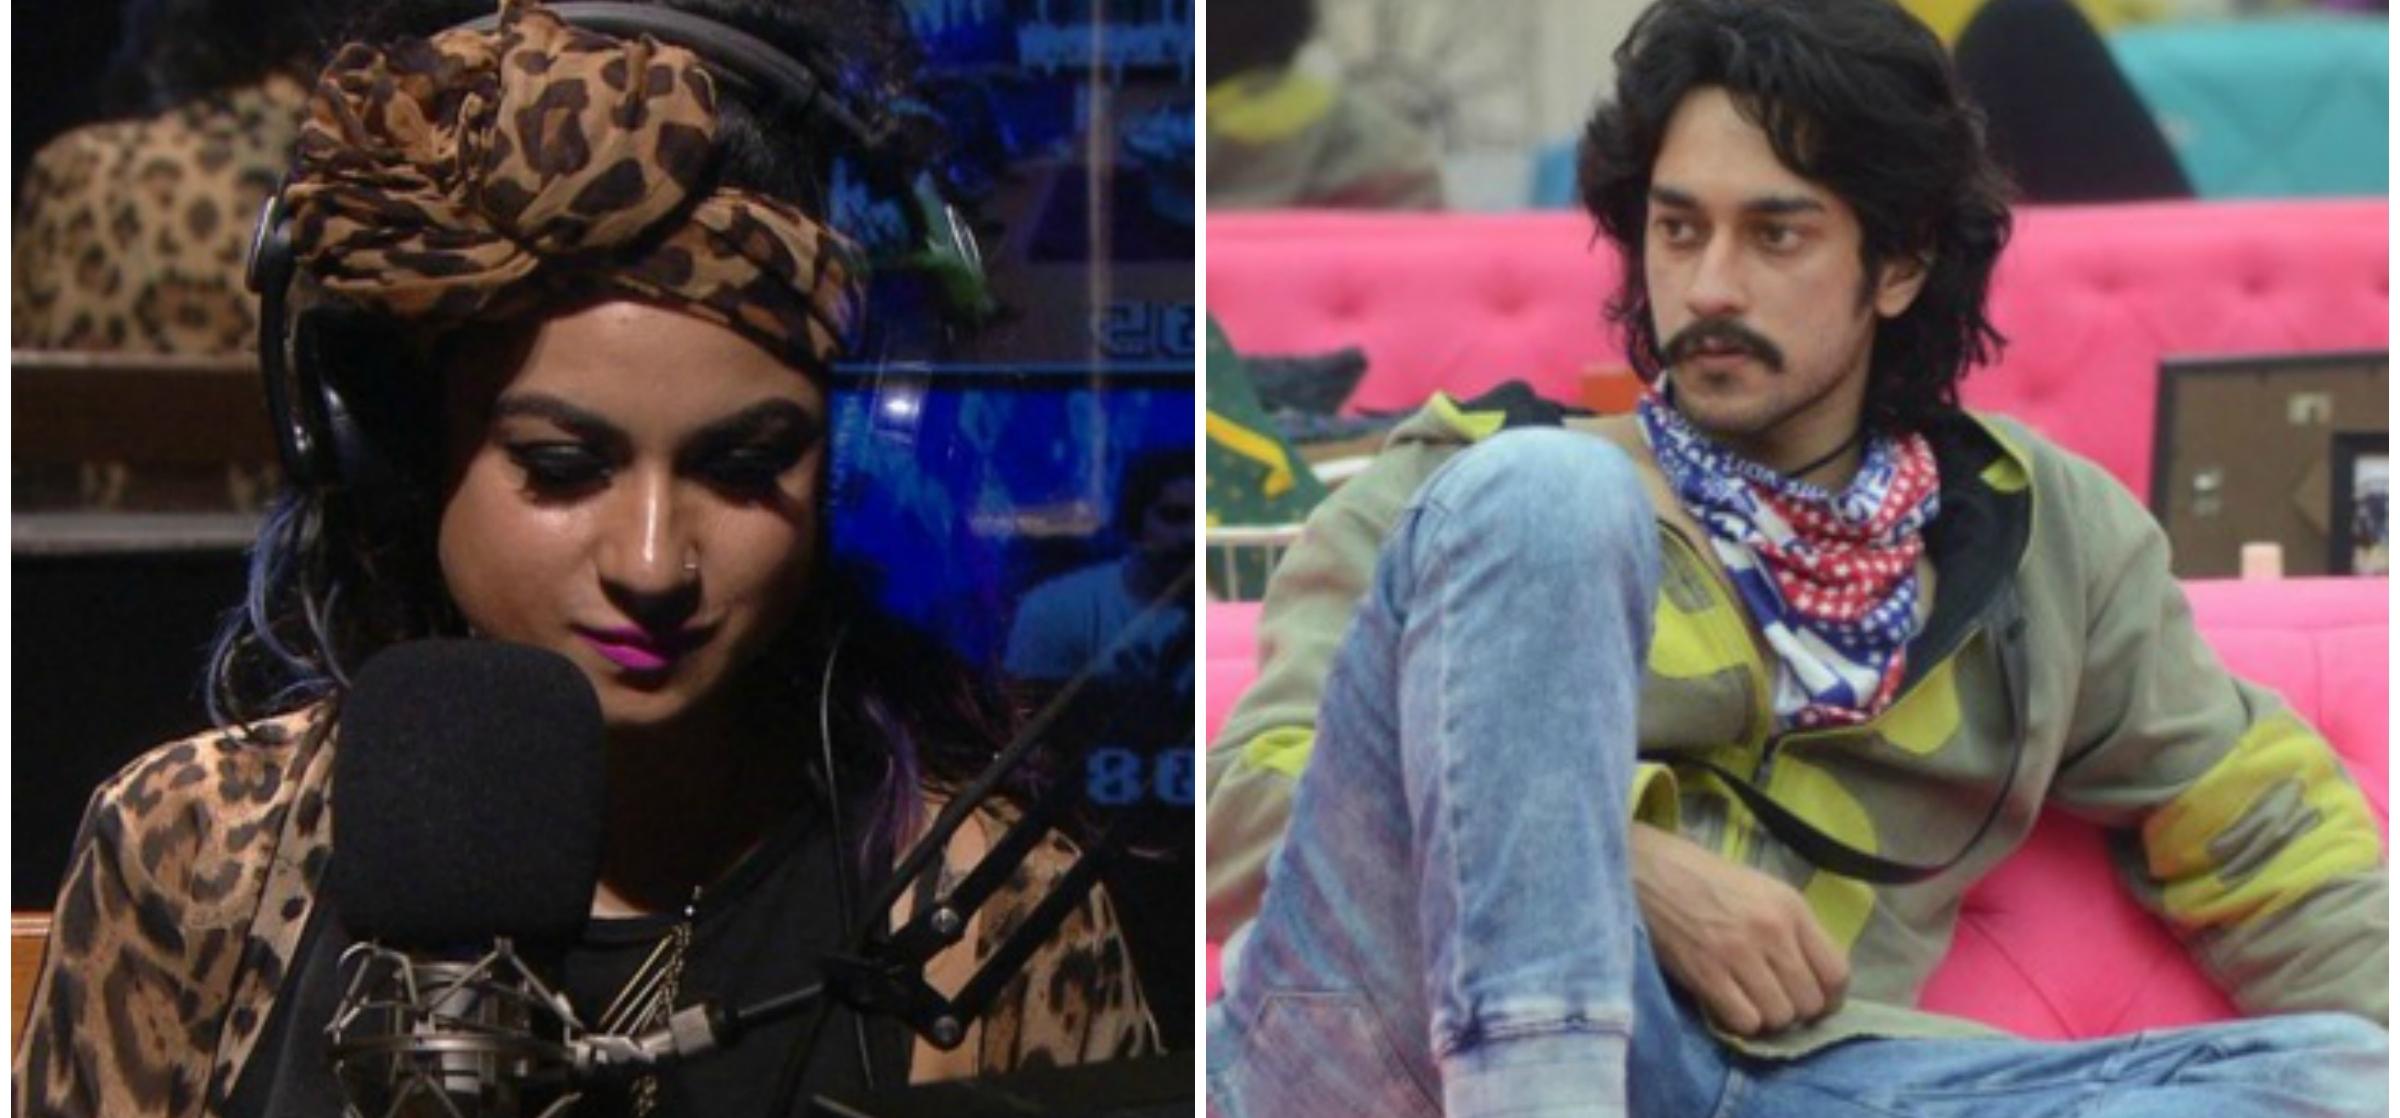 Bigg Boss 9 Wild Card Entrant Priya Malik Drops The First Bomb Accuses Rishabh Of Sexual Abuse